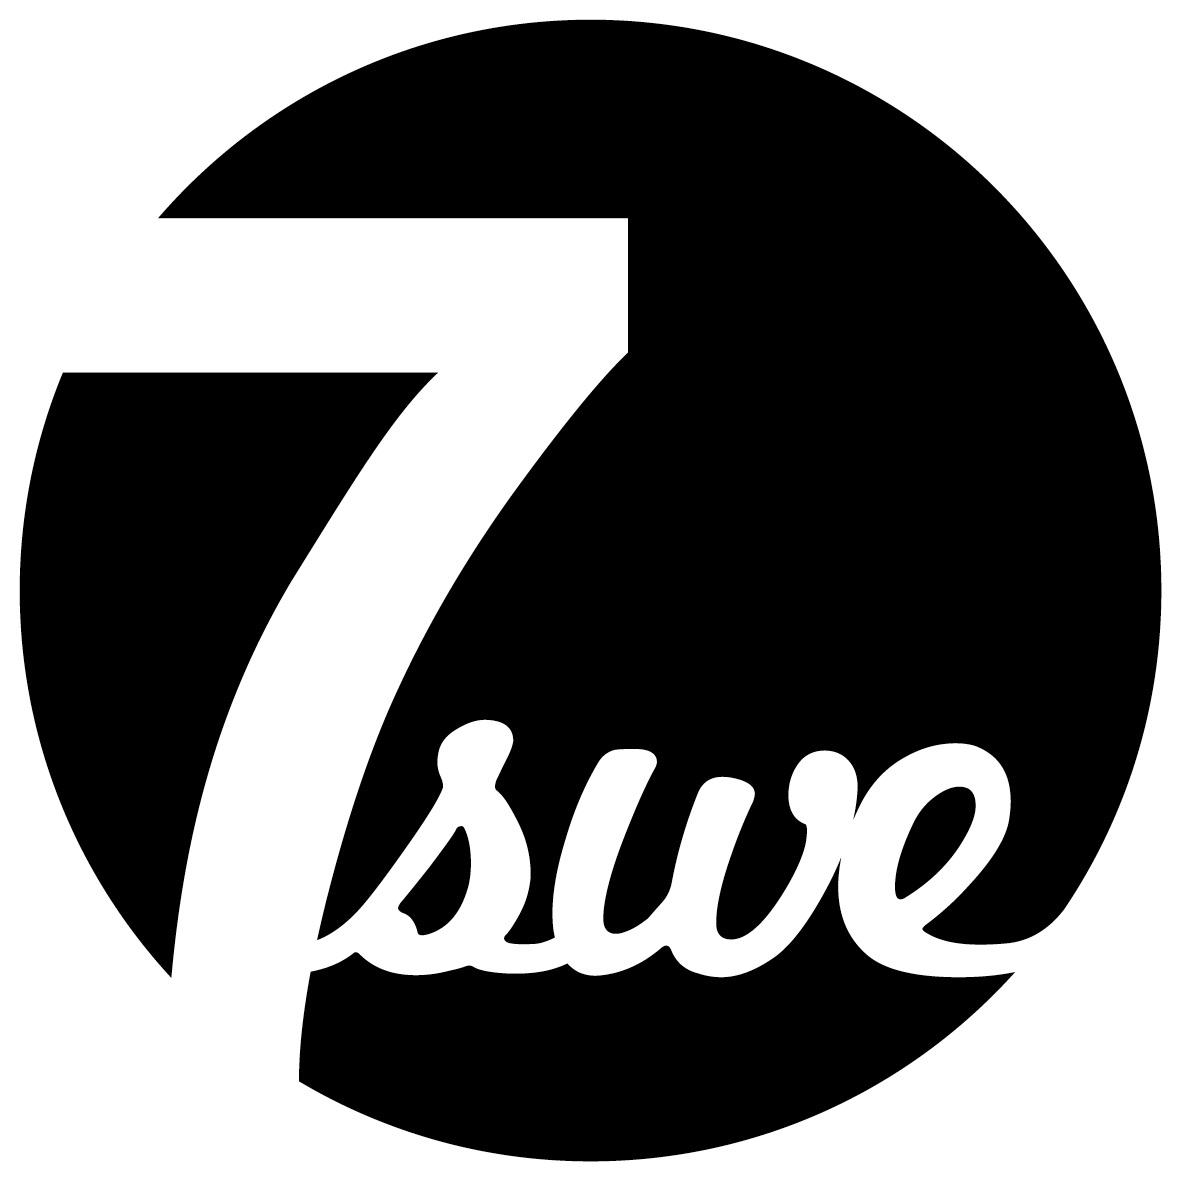 7swe merch